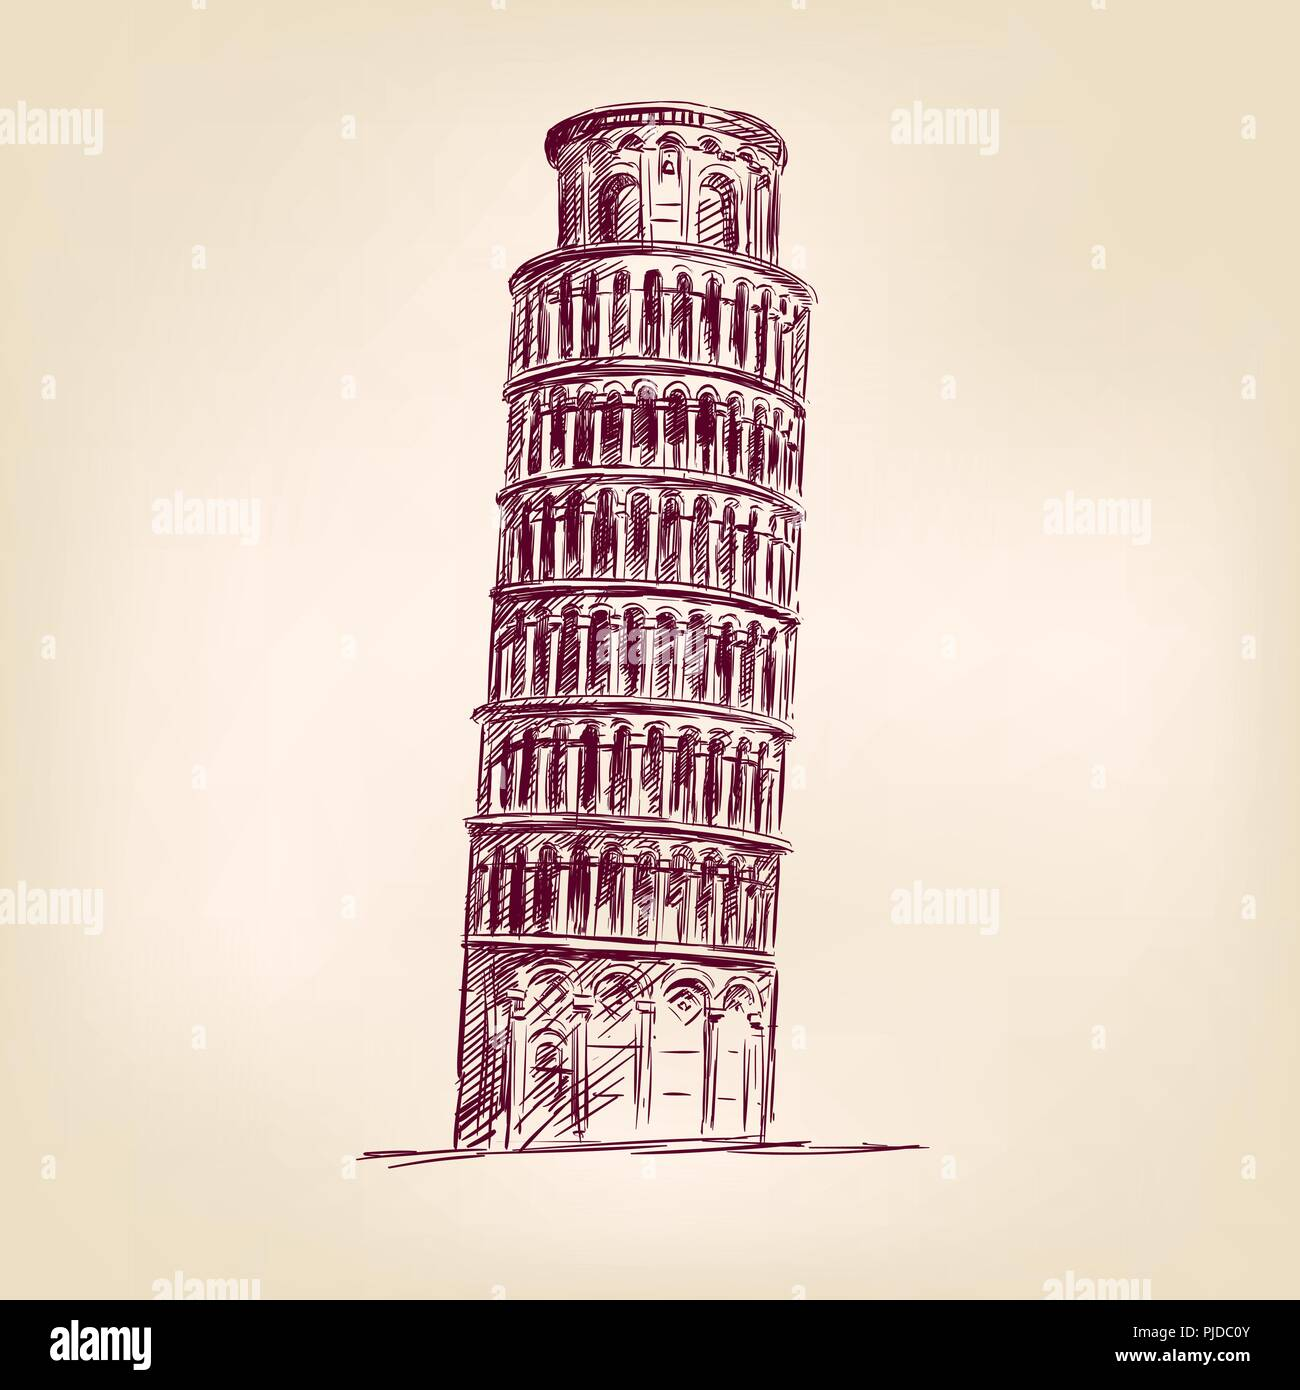 Pisa Tower hand drawn vector illustration realistic sketch - Stock Vector